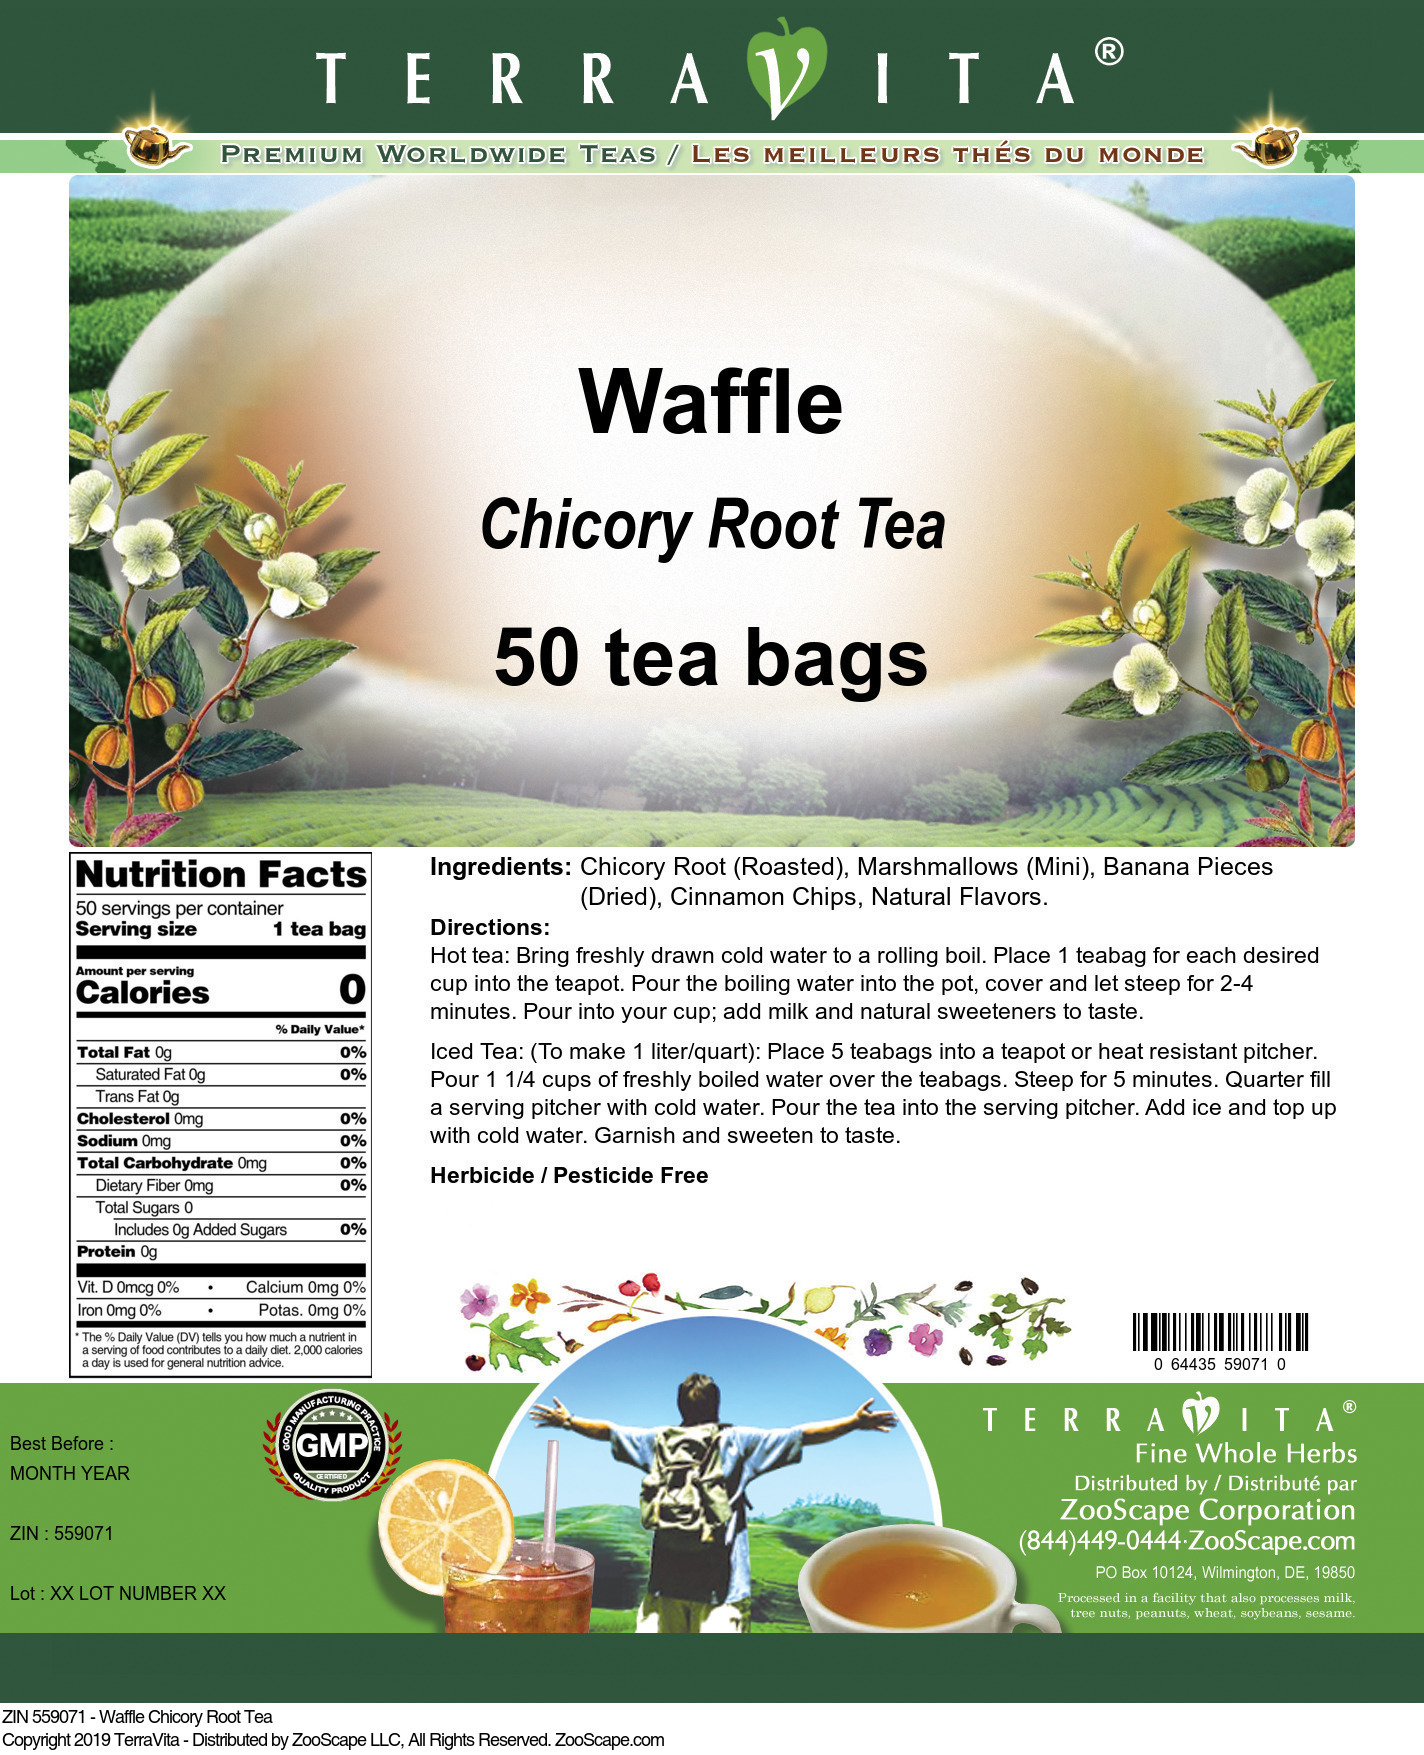 Waffle Chicory Root Tea